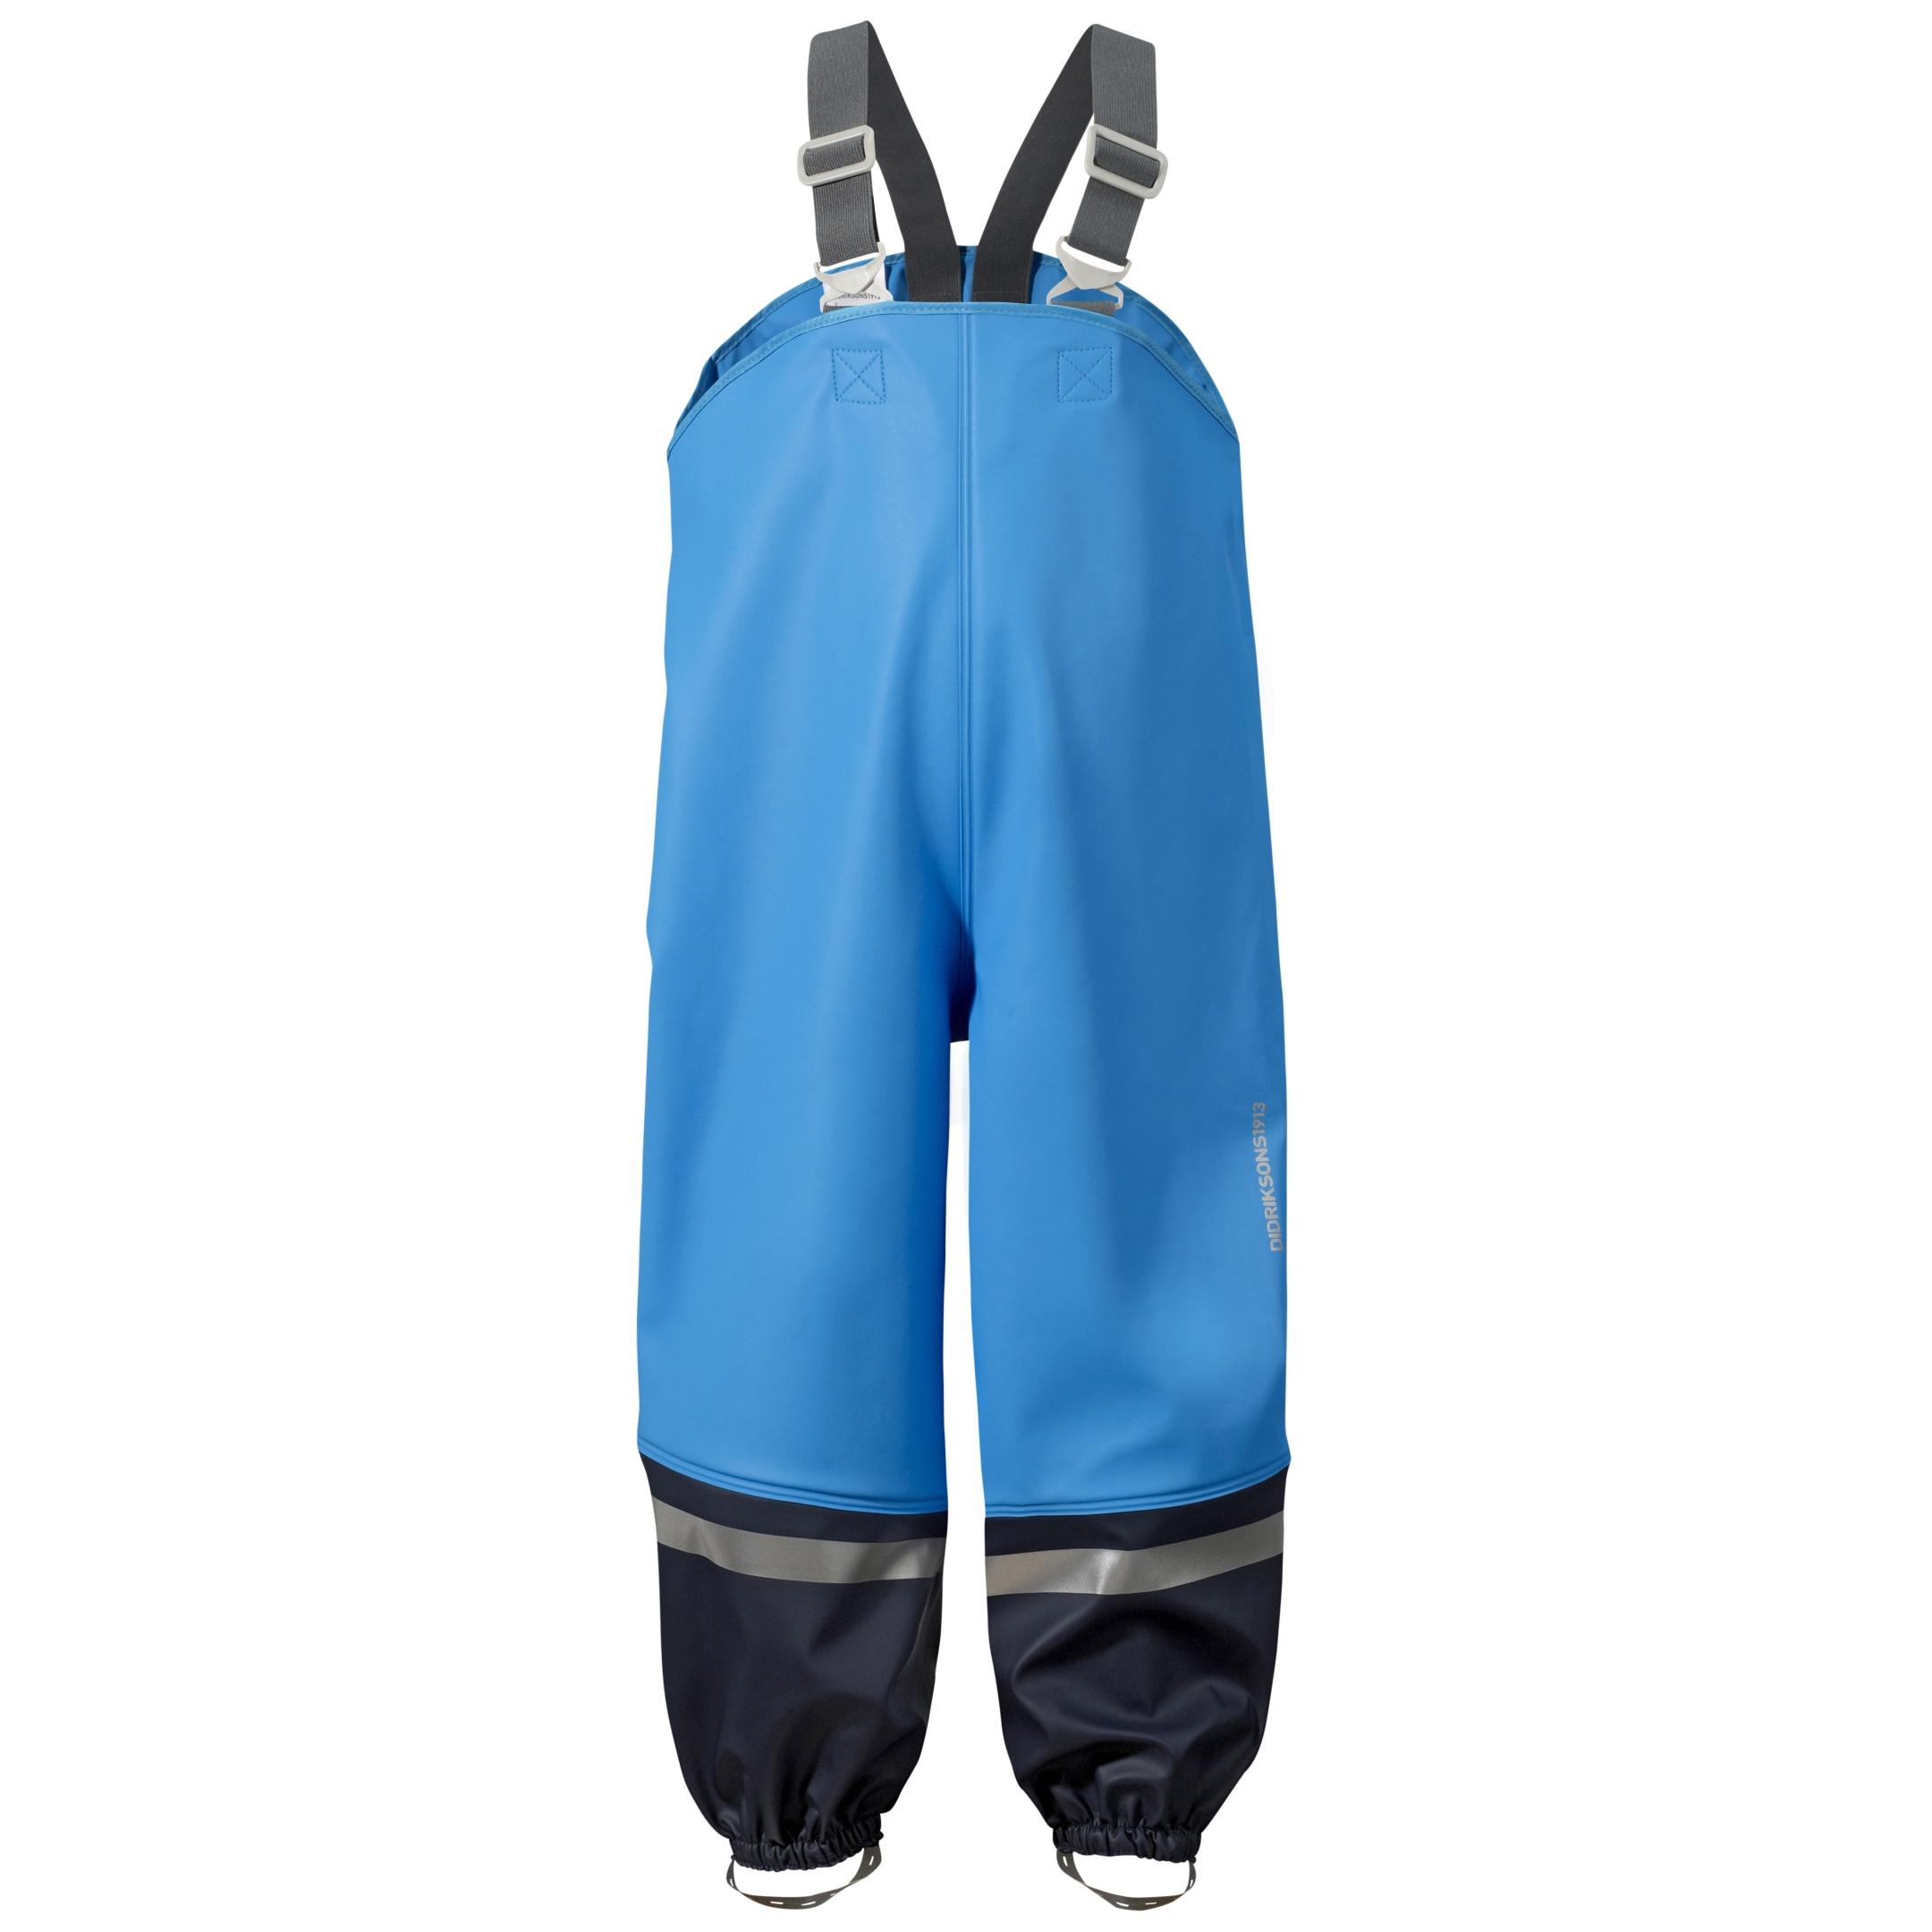 Дидриксон детский костюм дождевой WATERMAN + средство для стирки, - фото 4